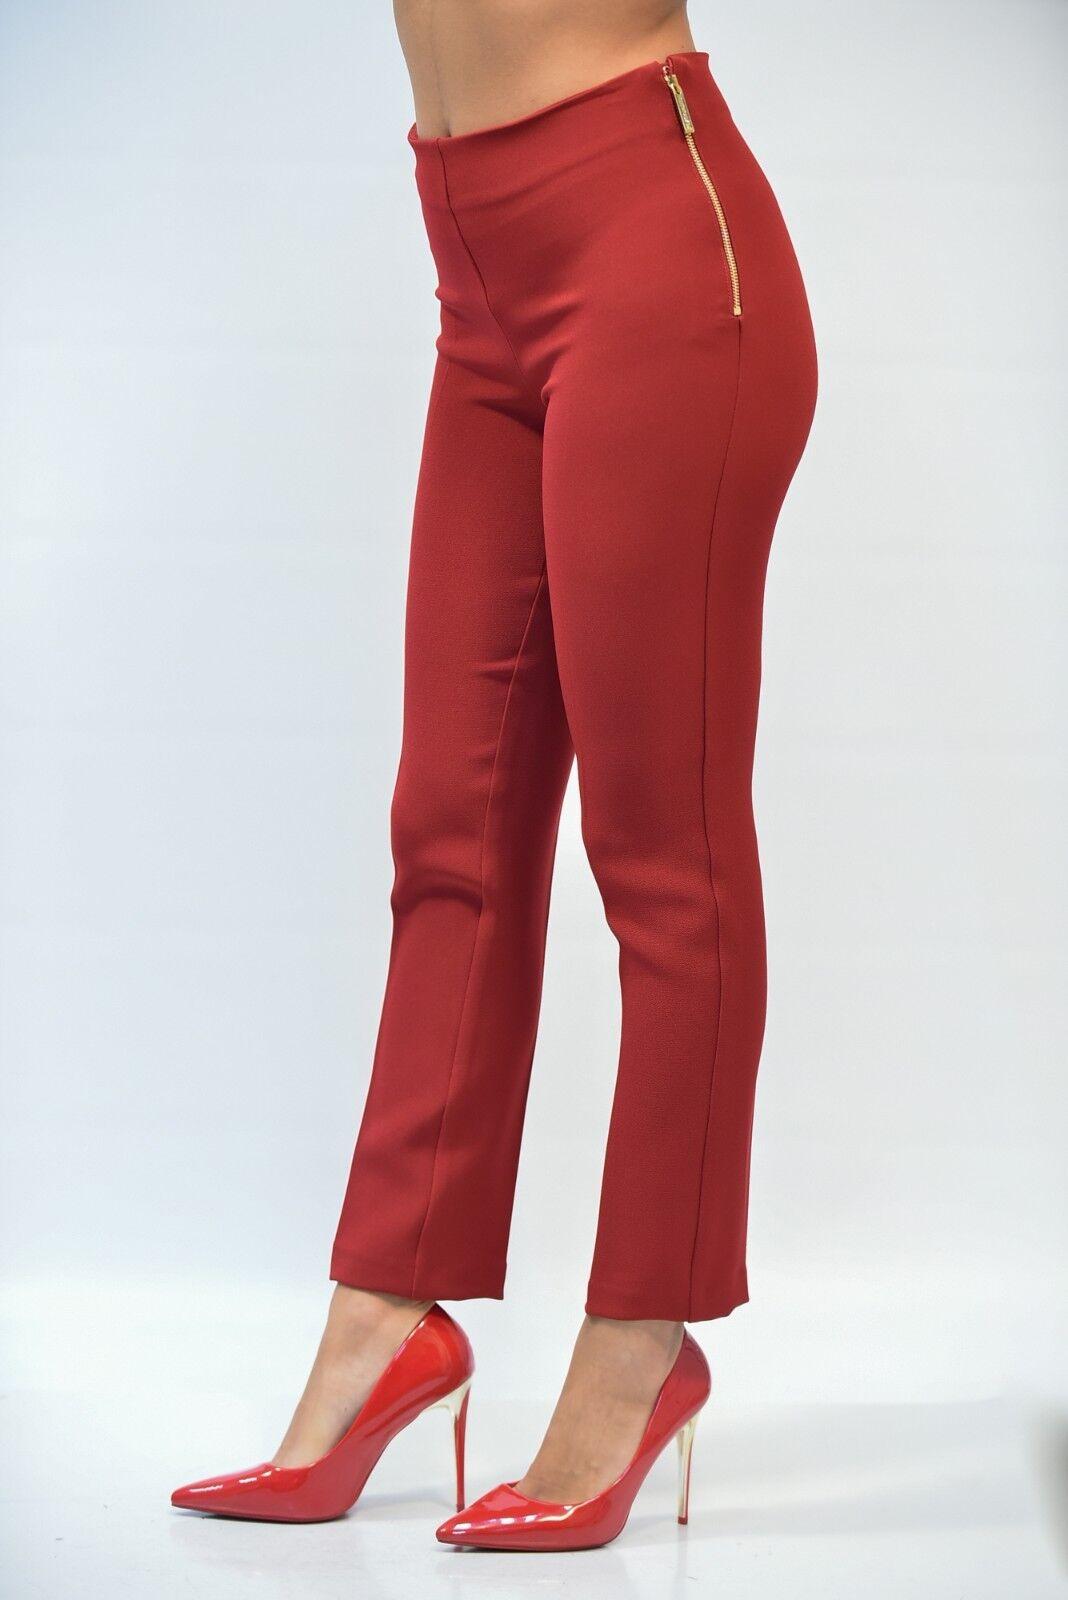 Trouser  166,00 - 50% Cristinaeffe Woman Leonor rot to 2018